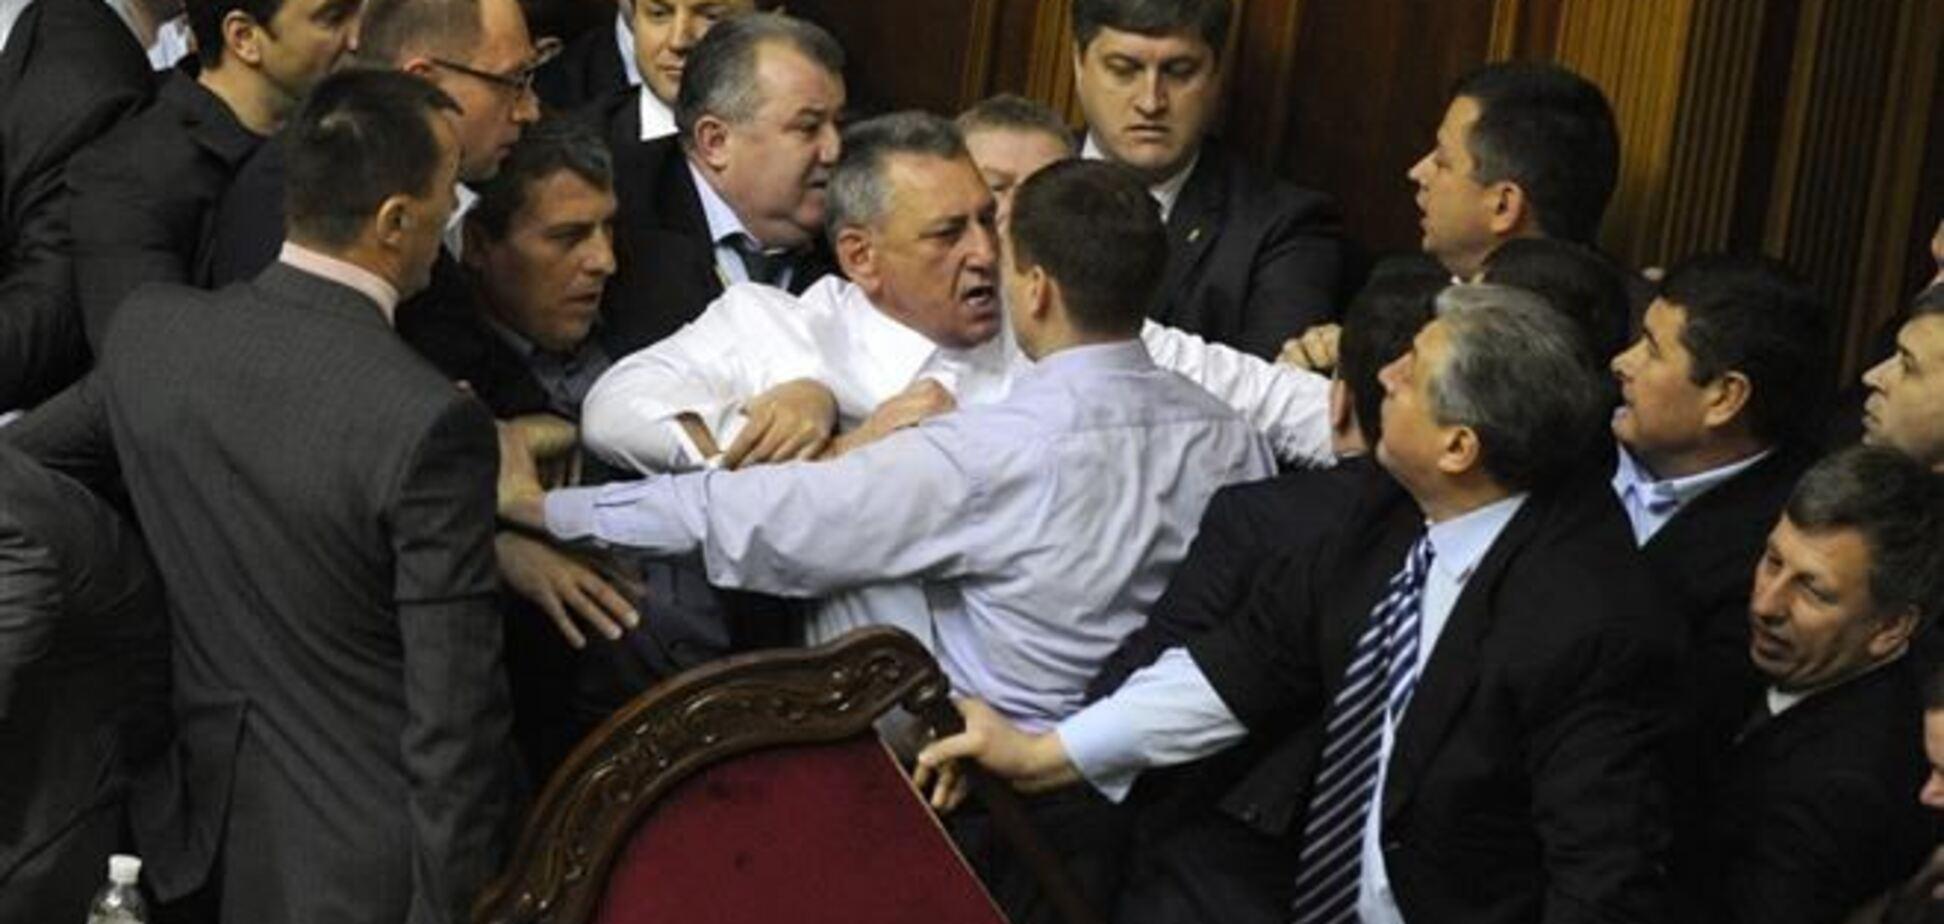 Украинские депутаты платят по $100 тысяч колдунам и ведьмам